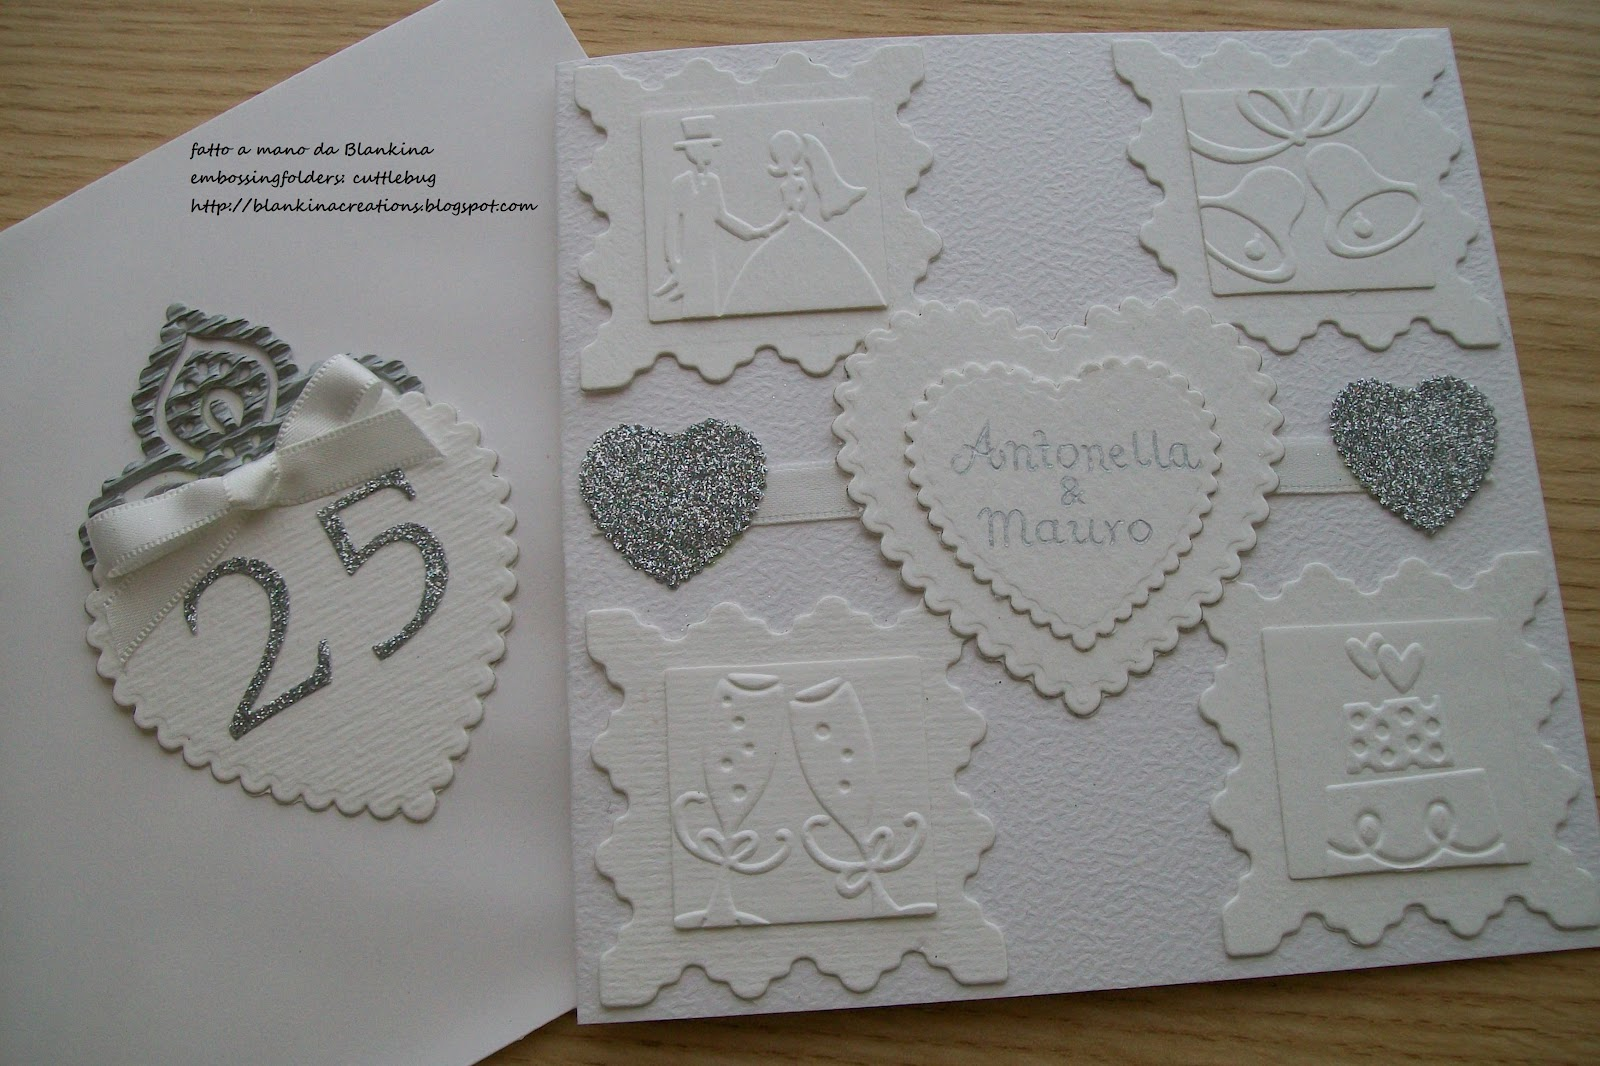 Anniversario Matrimonio Toscana : Blankina creations anniversario anni di matrimonio